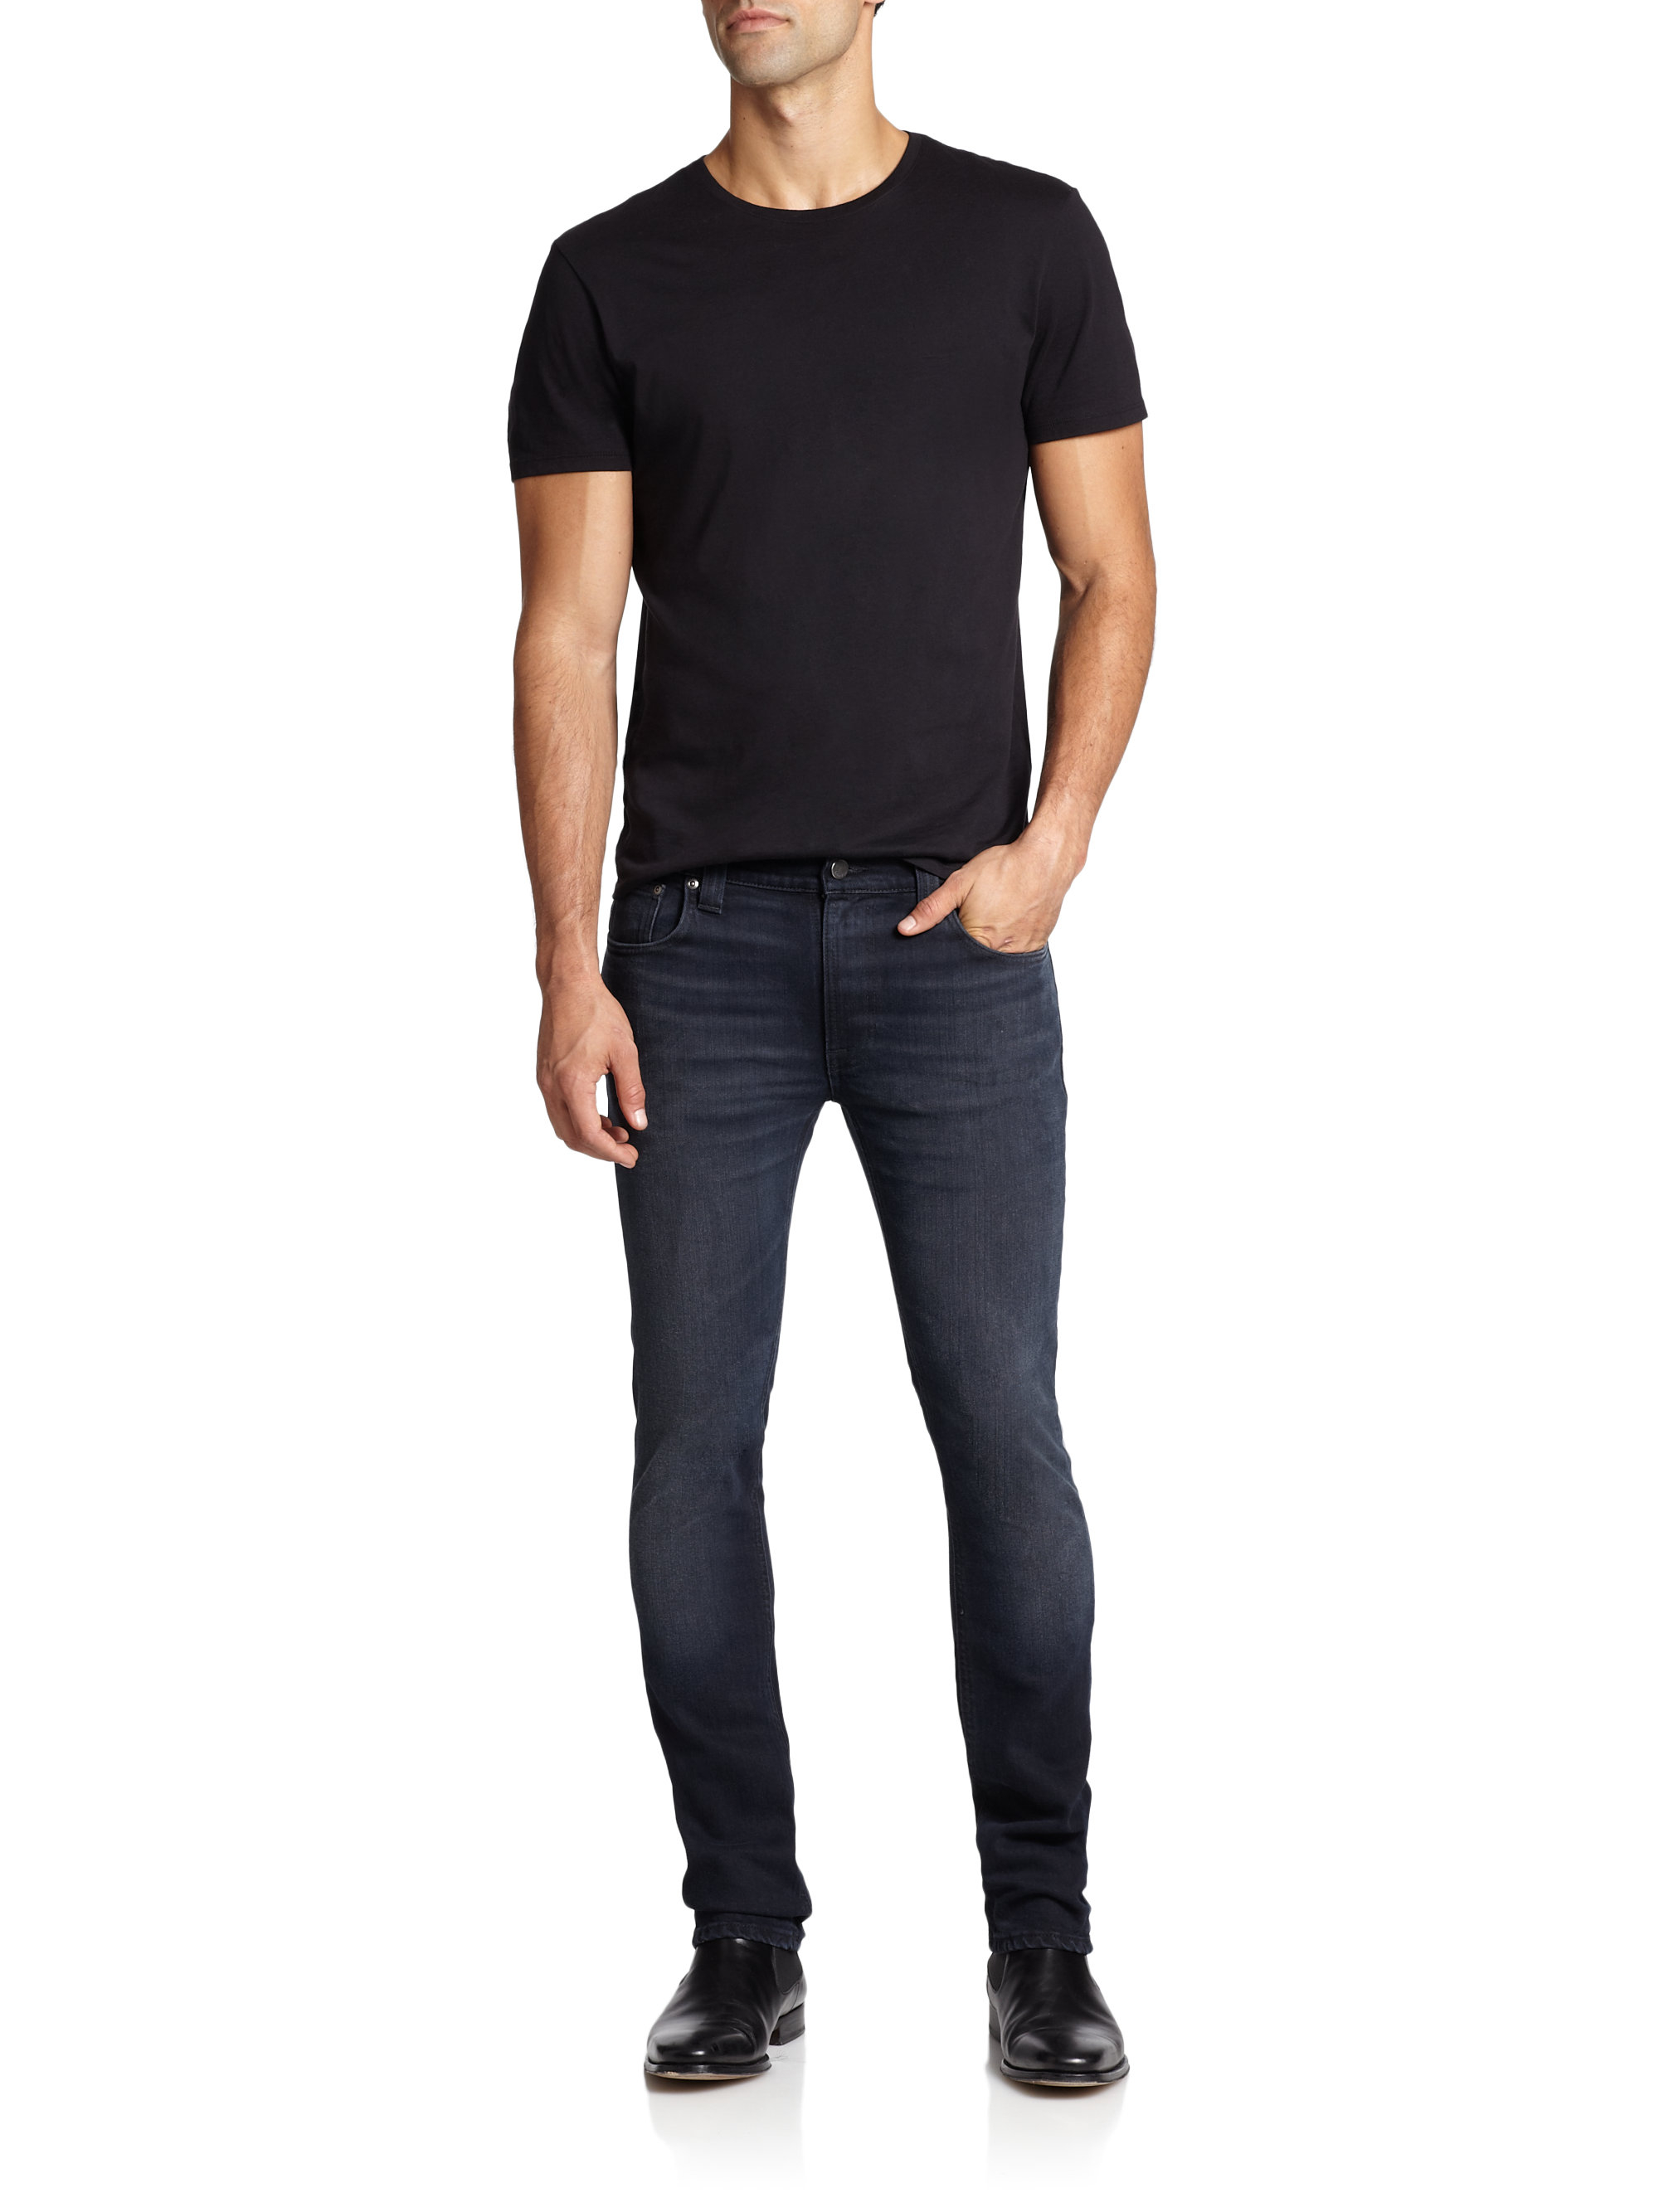 lyst nudie jeans thin finn slim straight leg jeans in. Black Bedroom Furniture Sets. Home Design Ideas